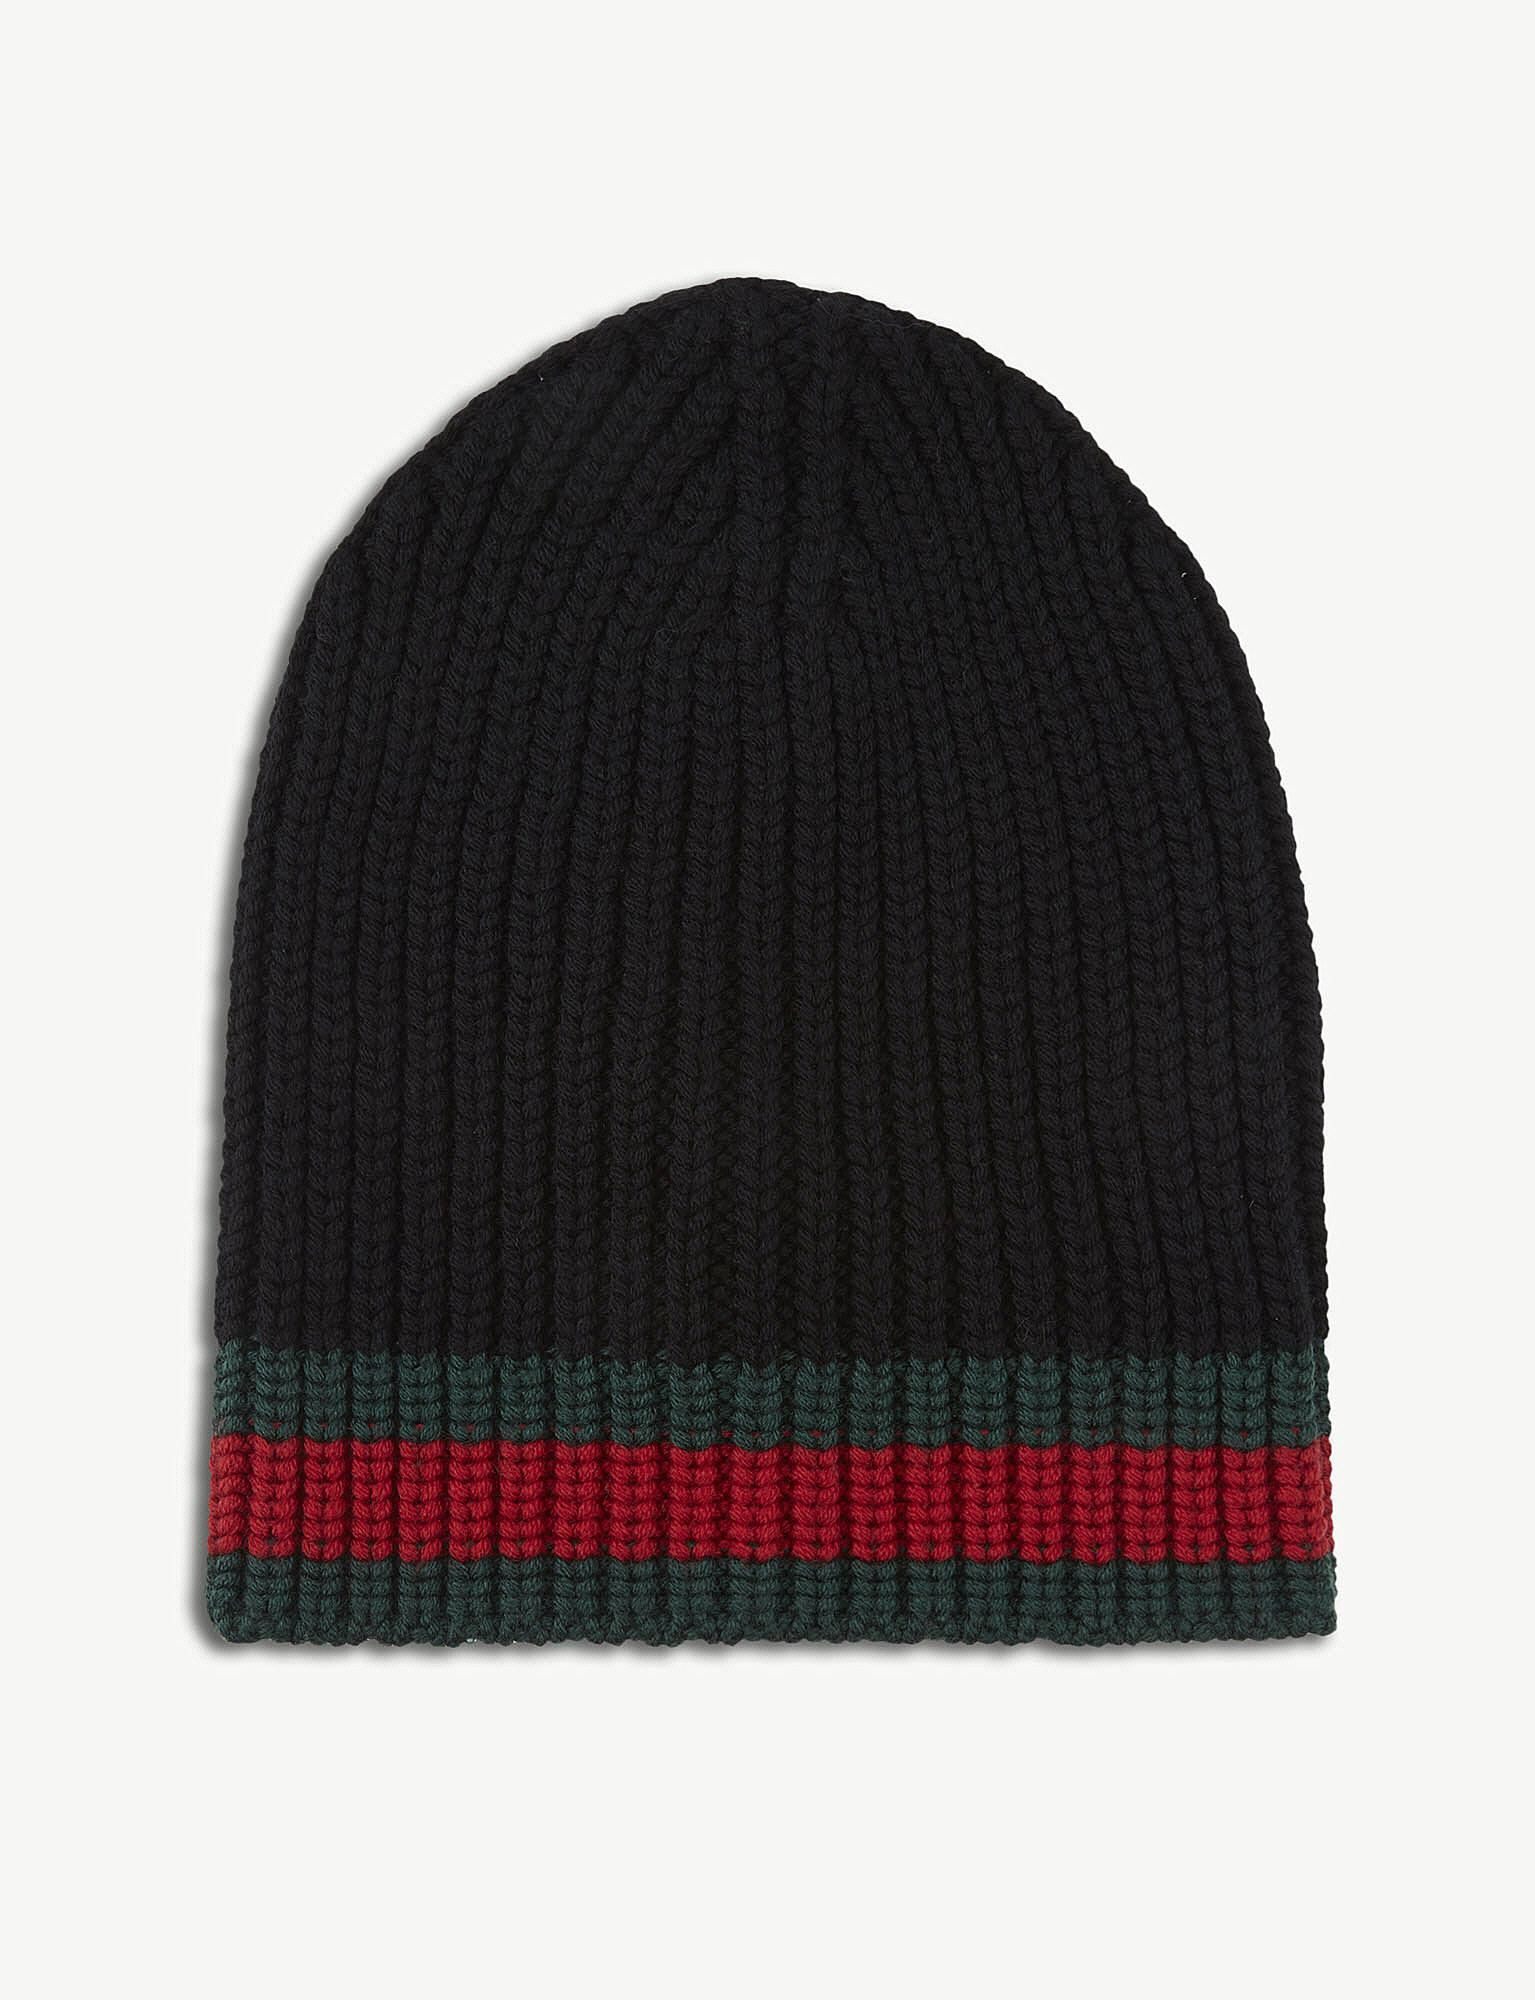 0e397fa66d37c Lyst - Gucci Striped Wool Beanie in Black for Men